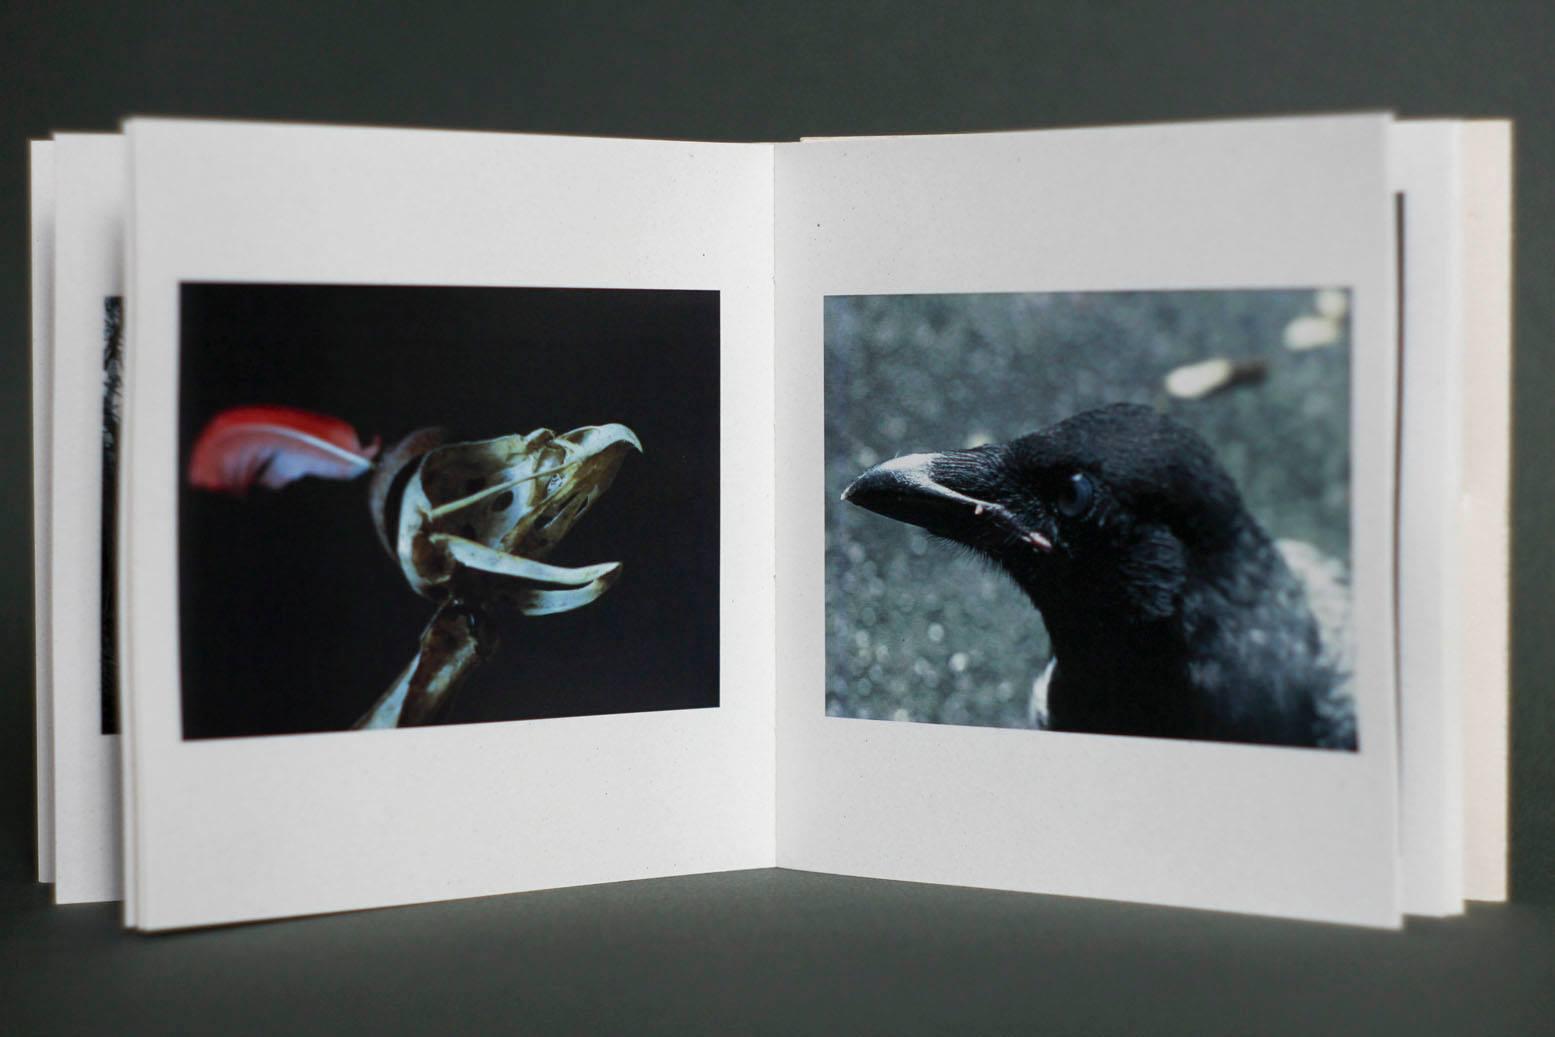 supra-natura-booklet-dvd-by-perpetua-edizioni-03